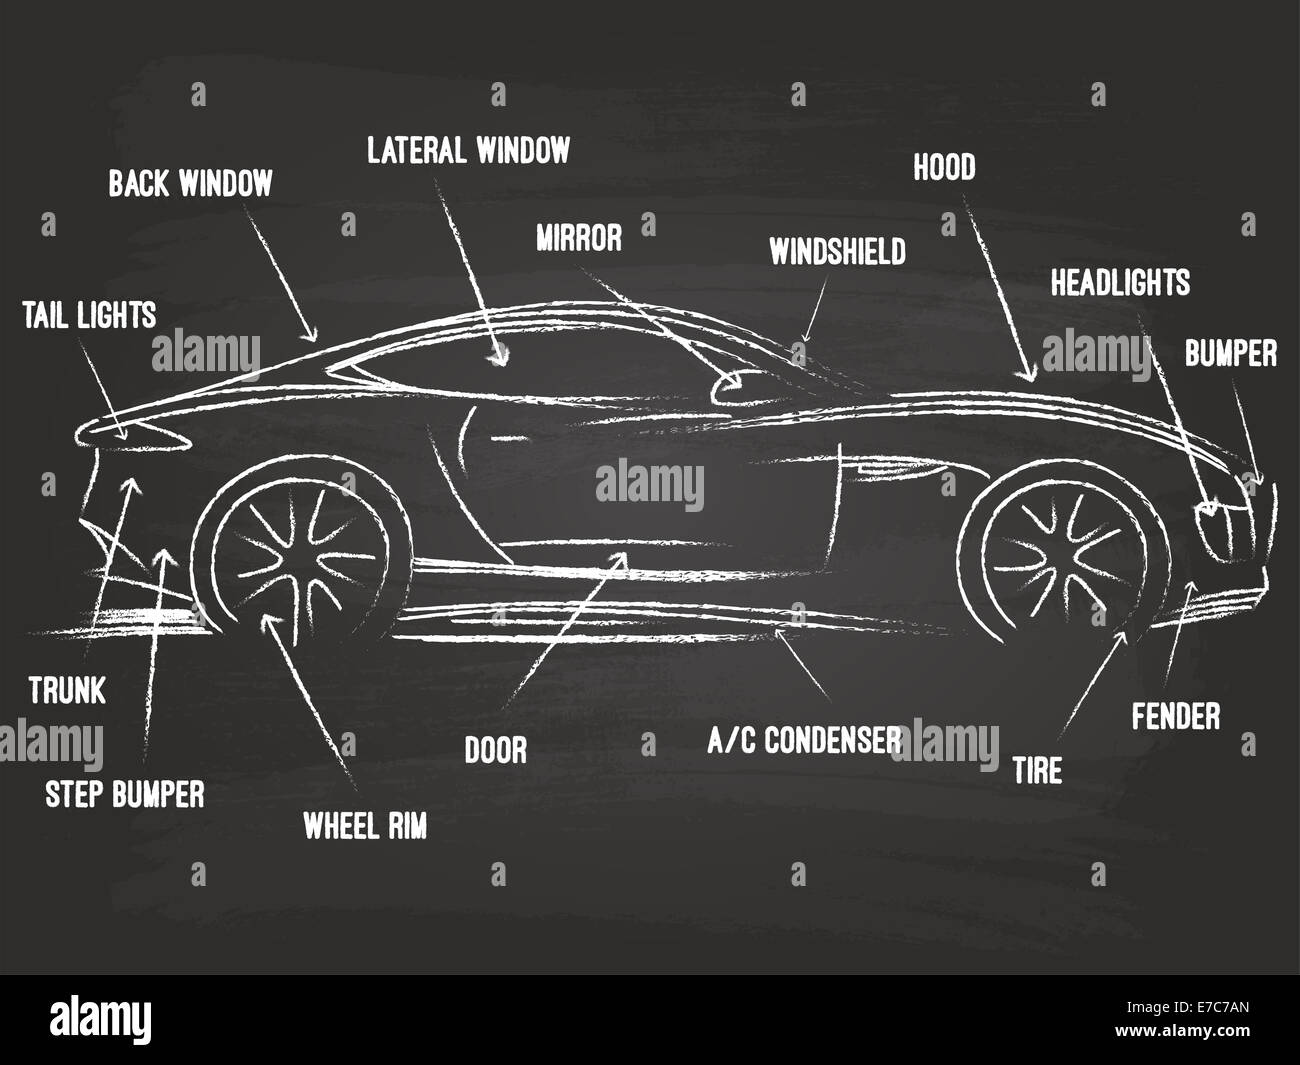 Car Parts Sketch On Blackboard Stock Photo: 73413277 - Alamy